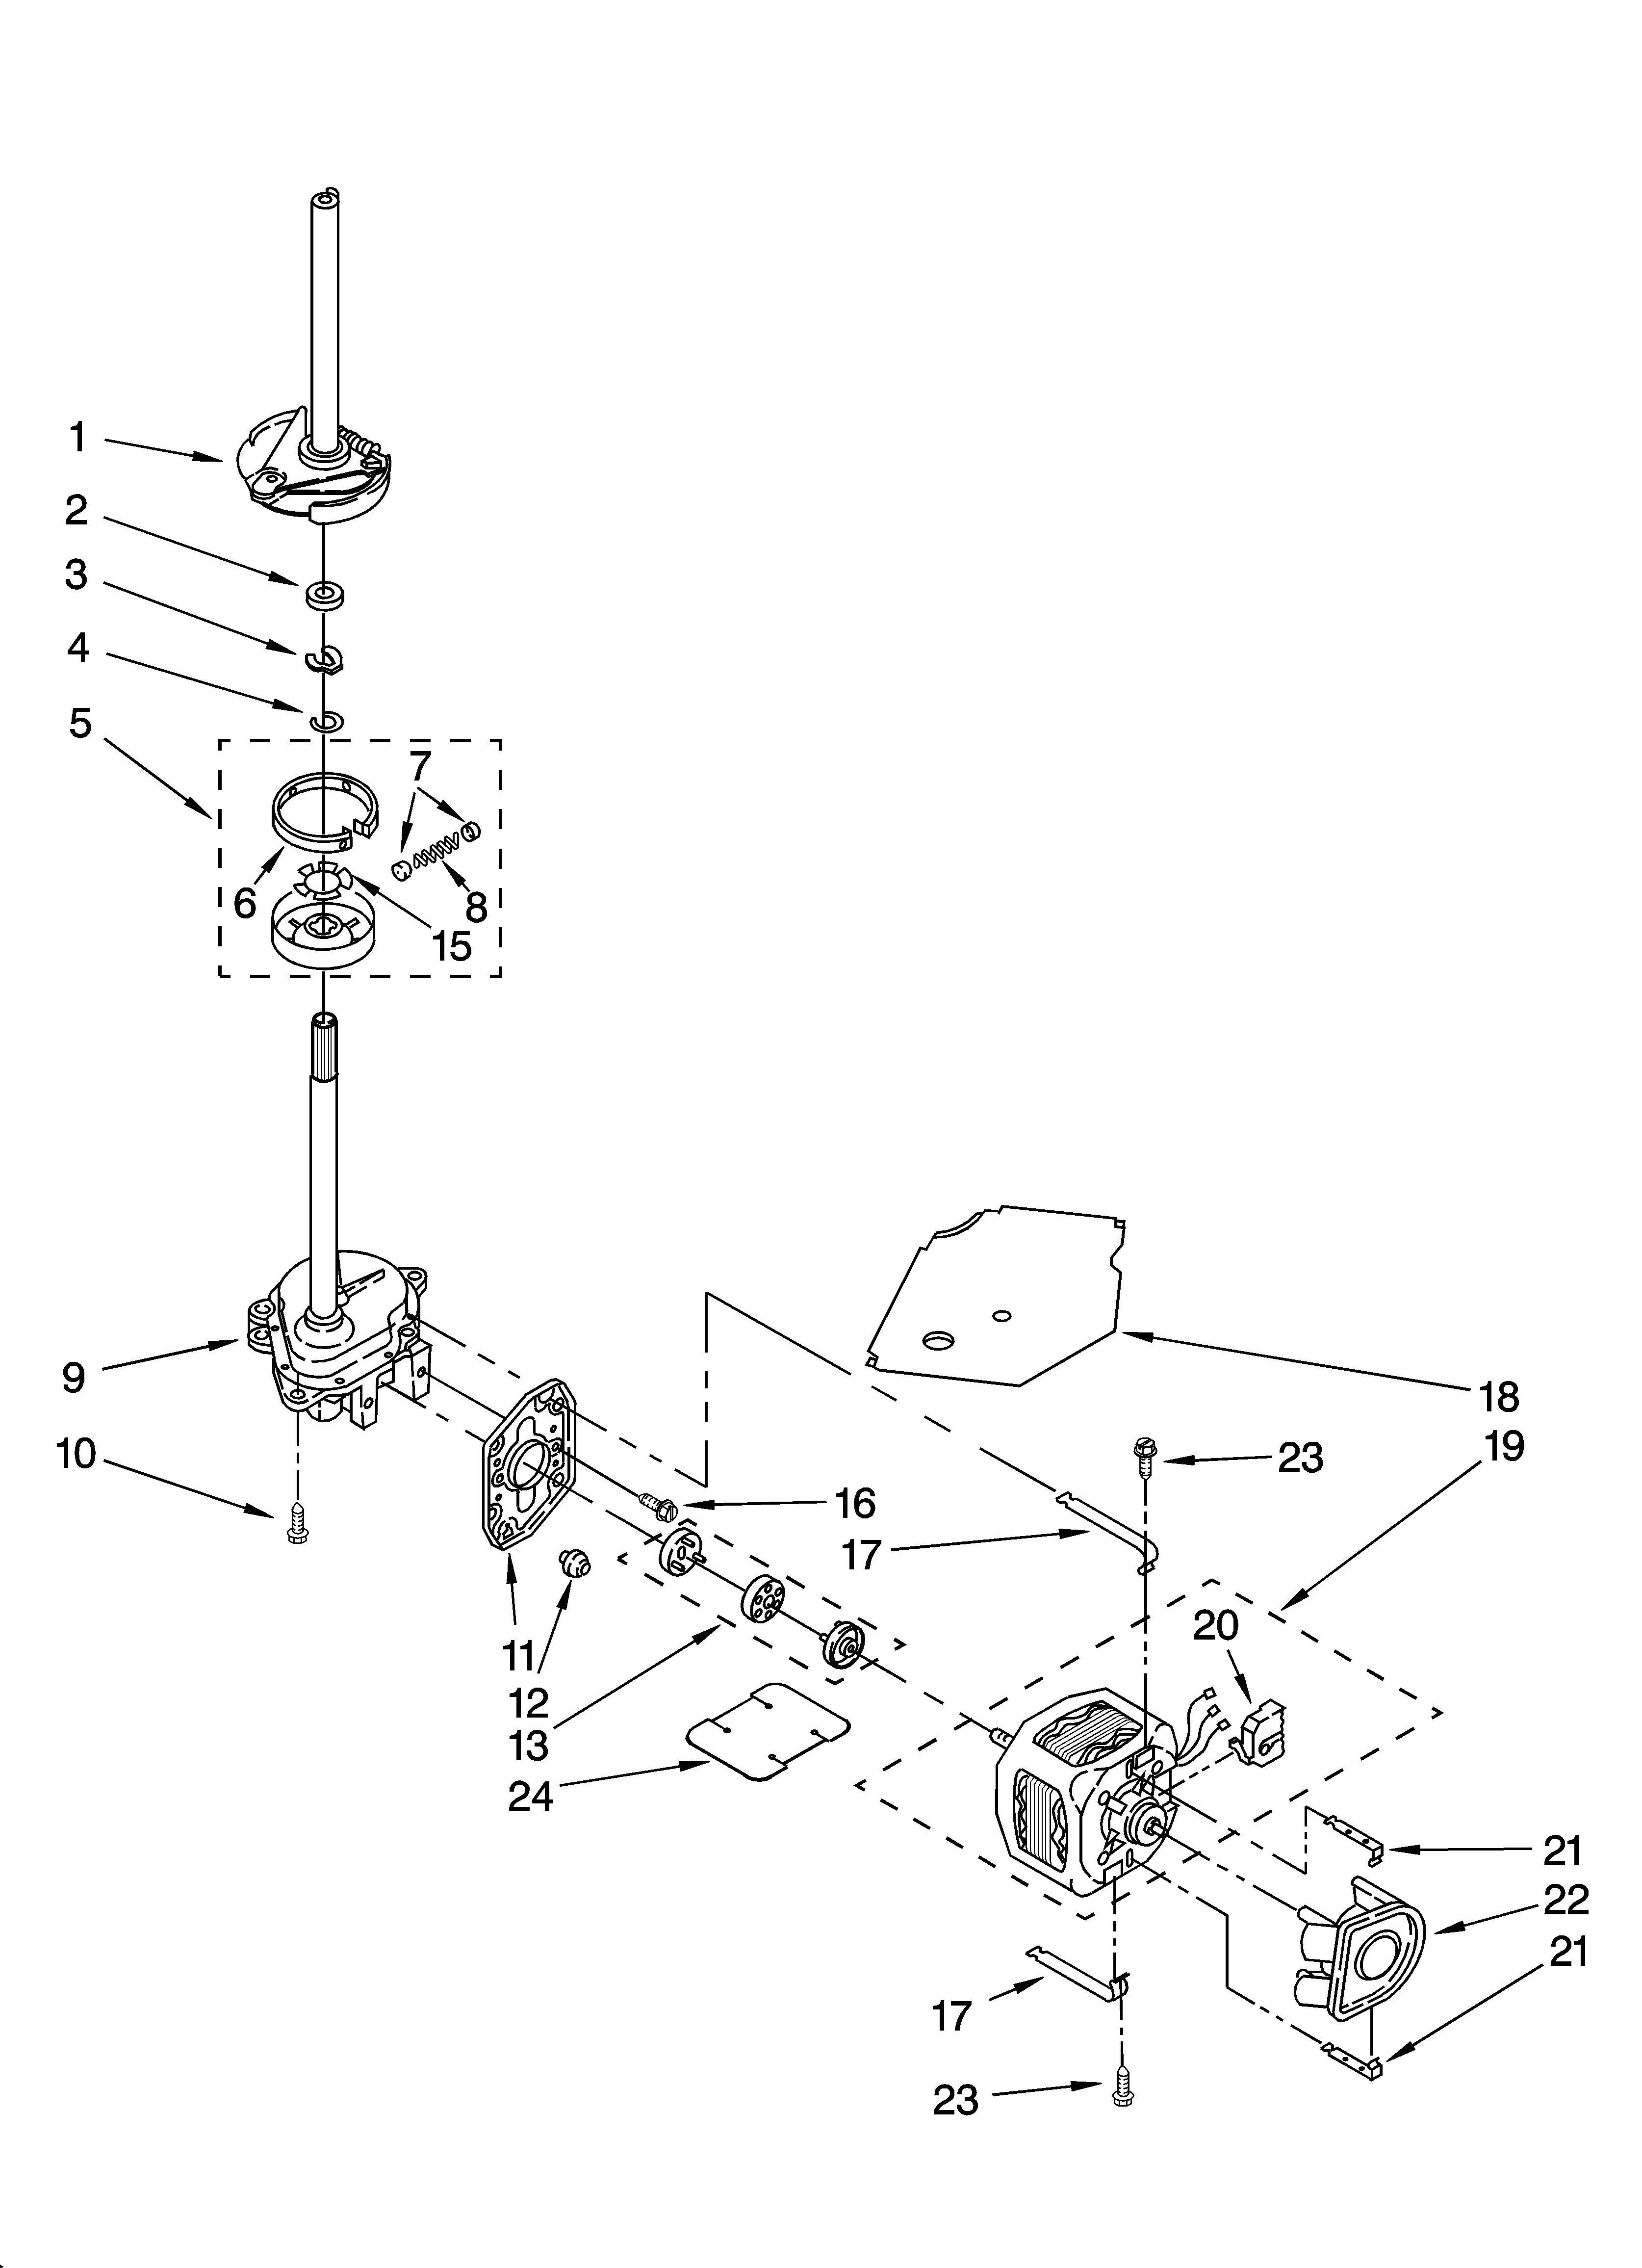 honda elite 80 parts diagram billy goat tkv650sph parts